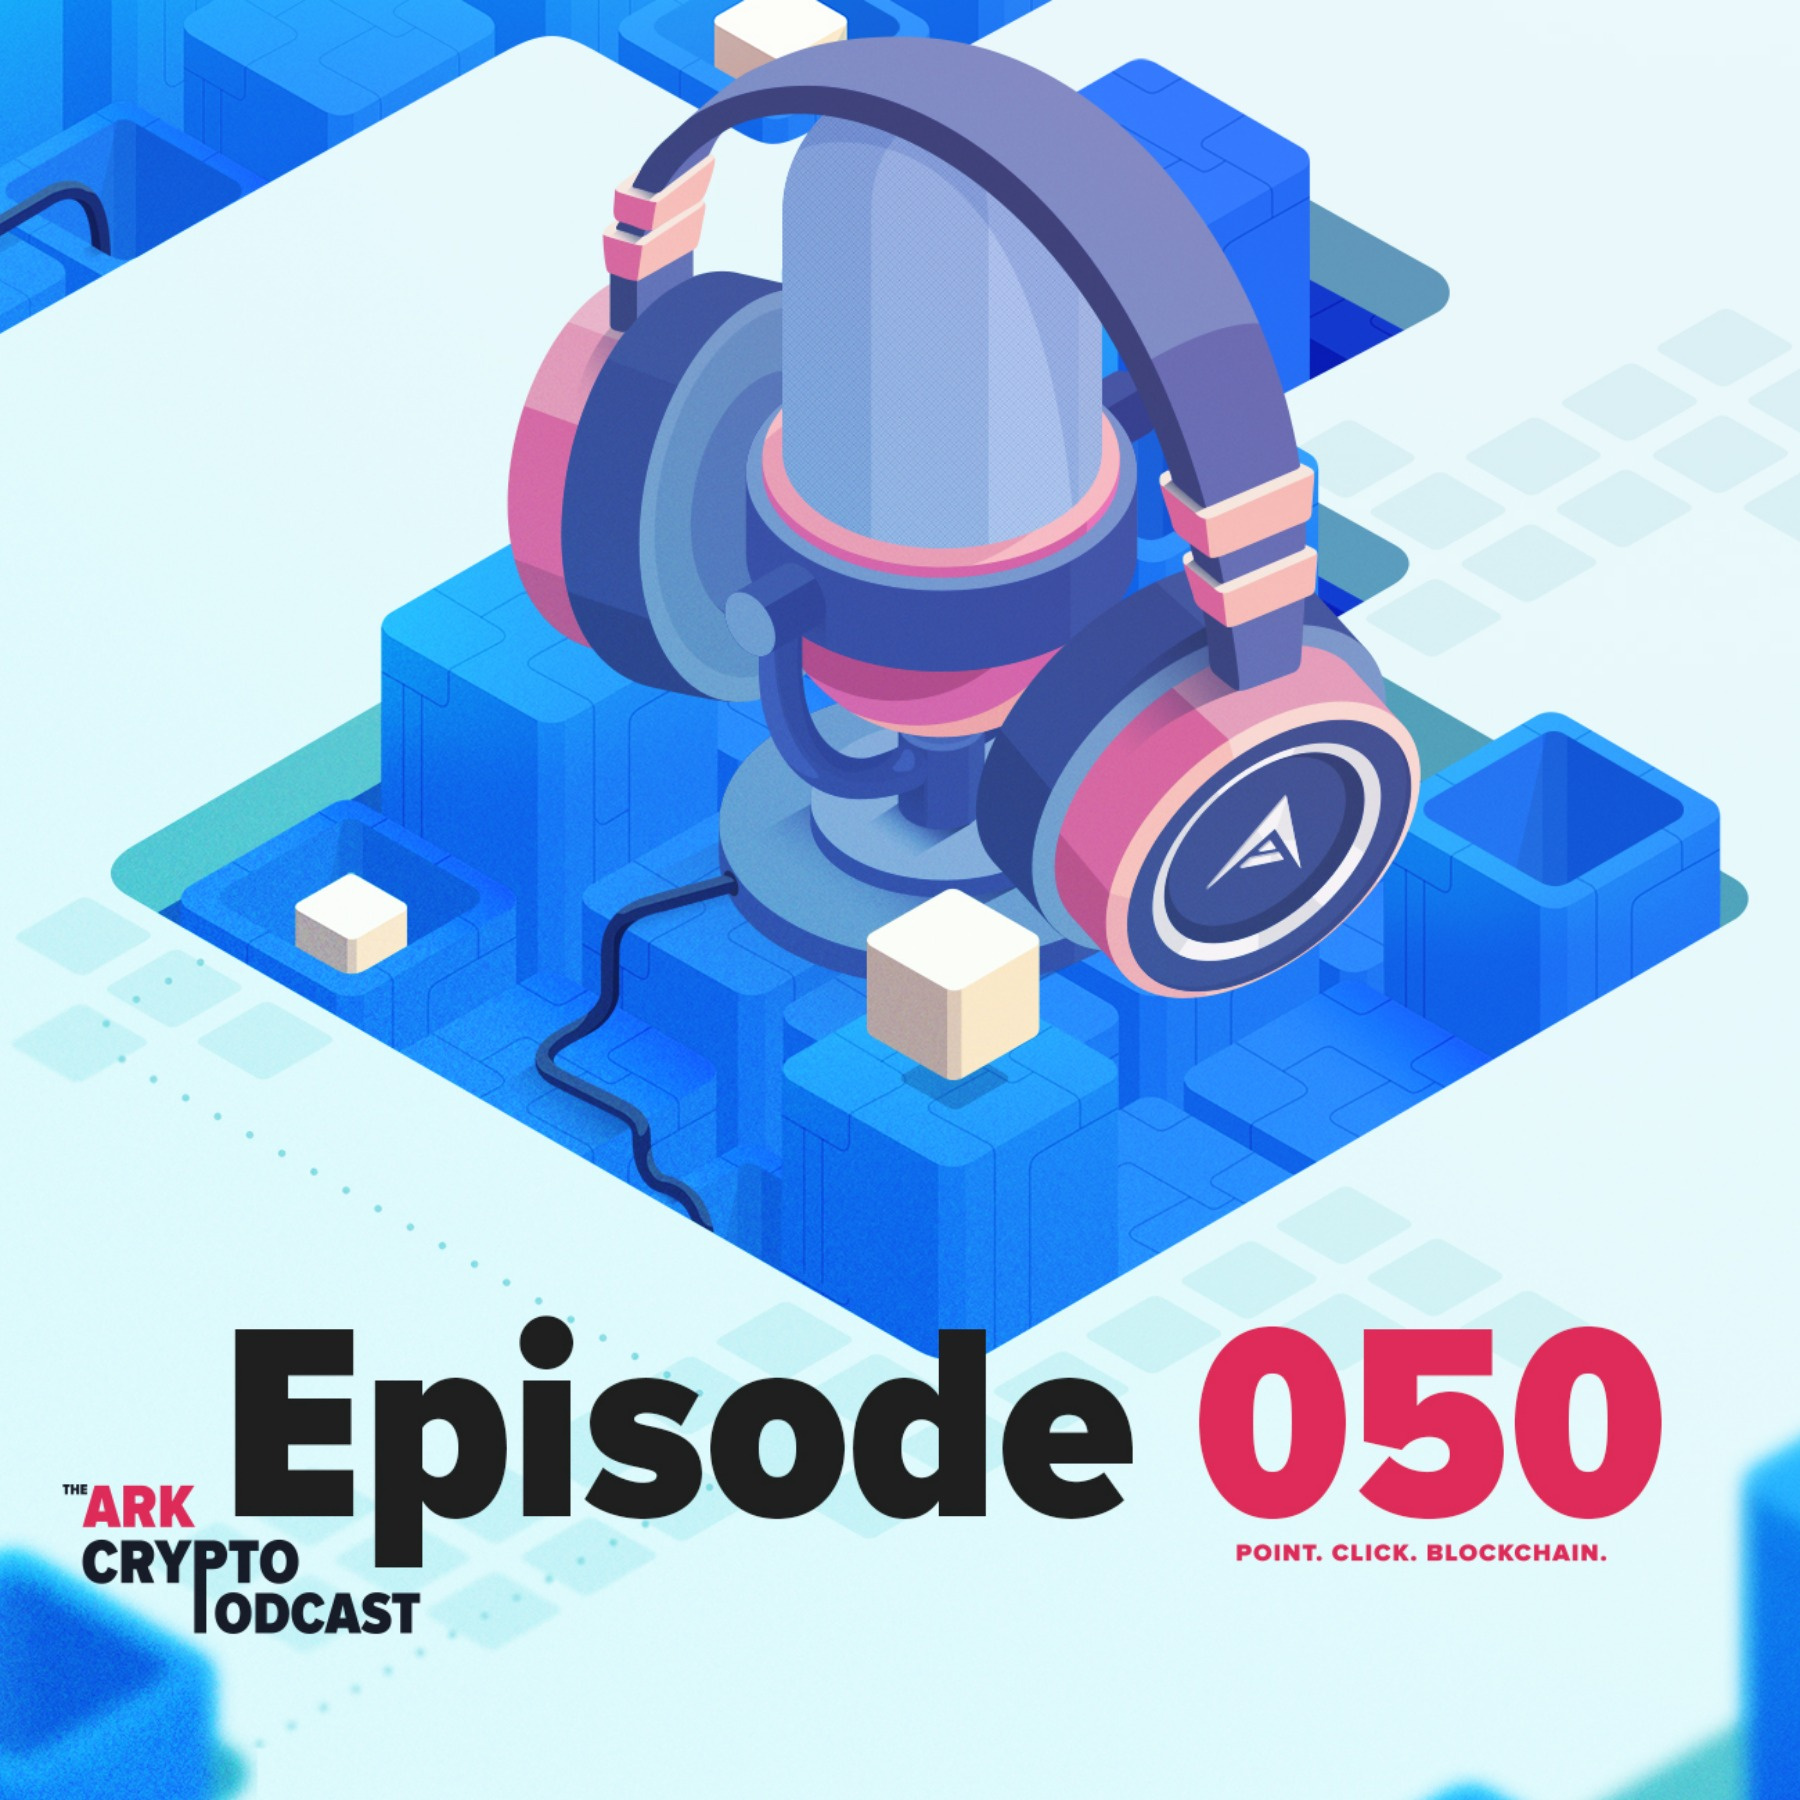 ARK Crypto Podcast #050 - What's New & ARK Advocate Program Details